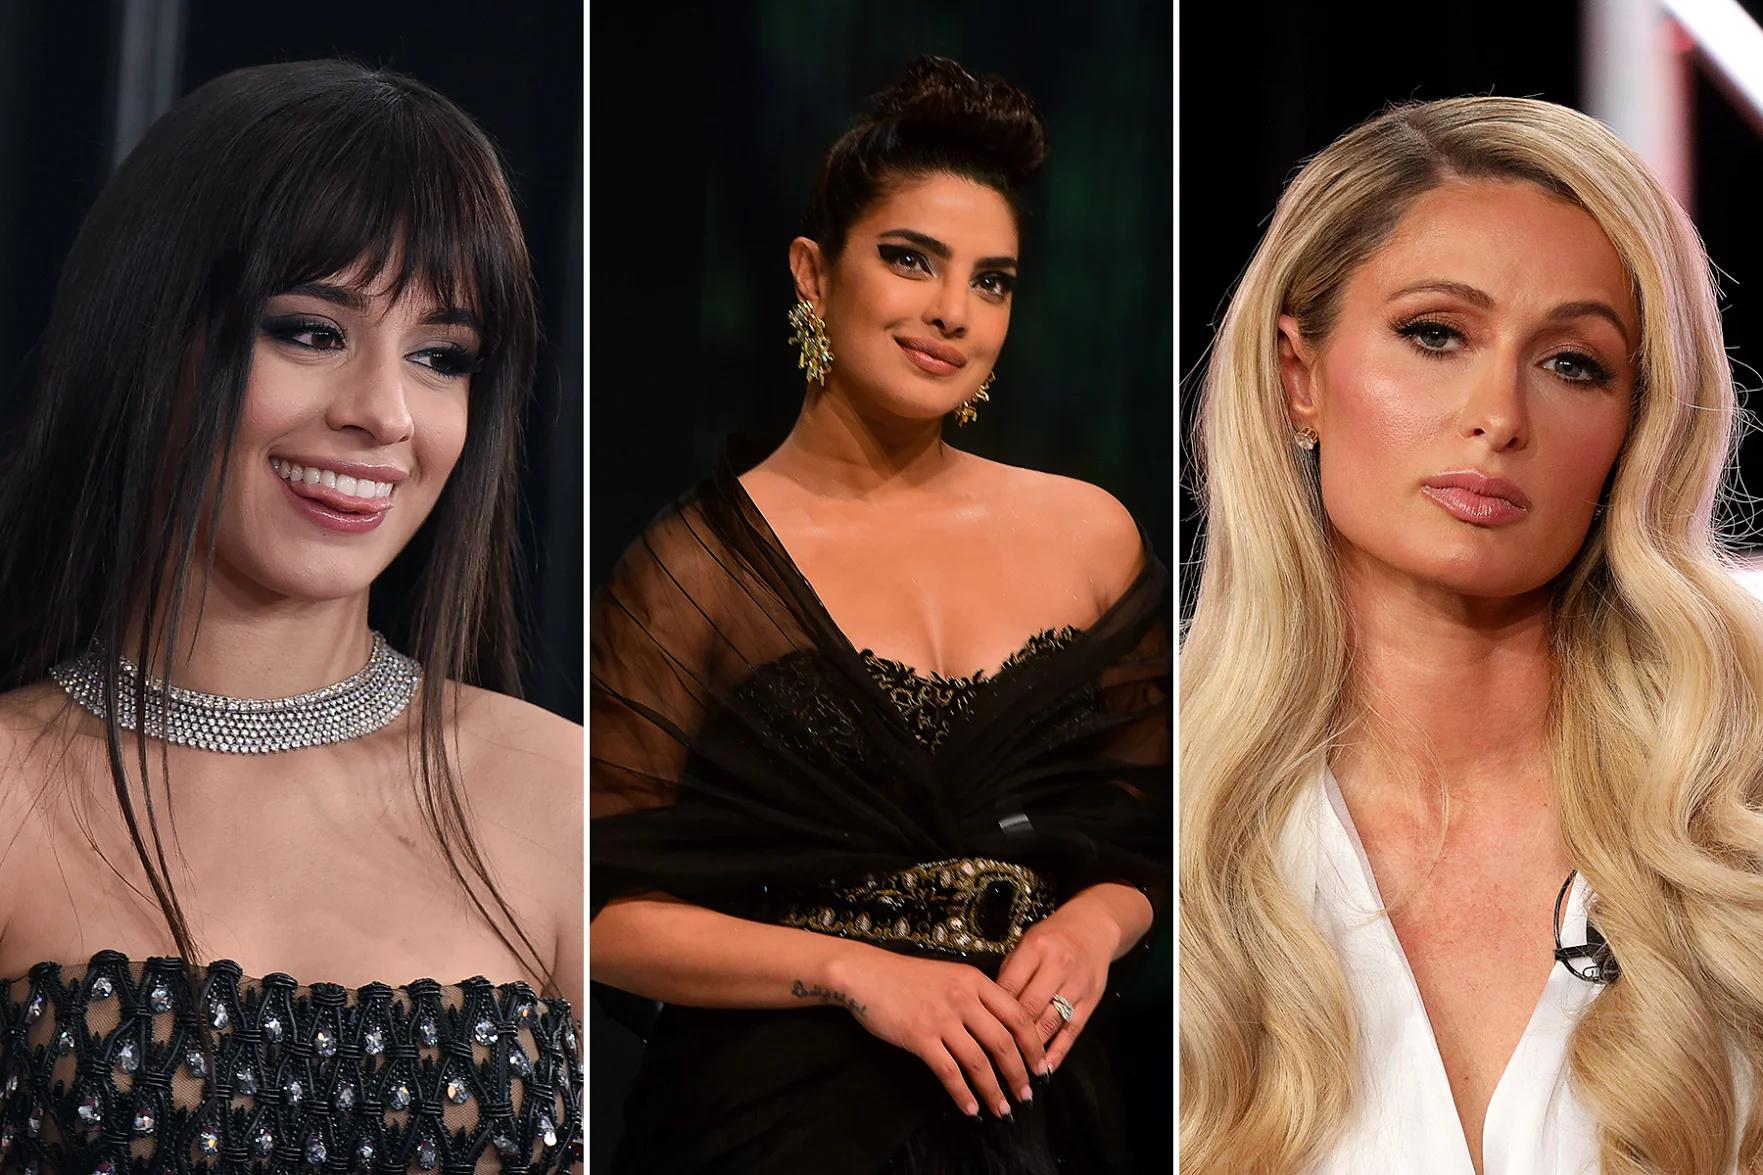 Camila Cabello, Paris Hilton, and Priyanka Chopra Invest in Avatar Startup Genies